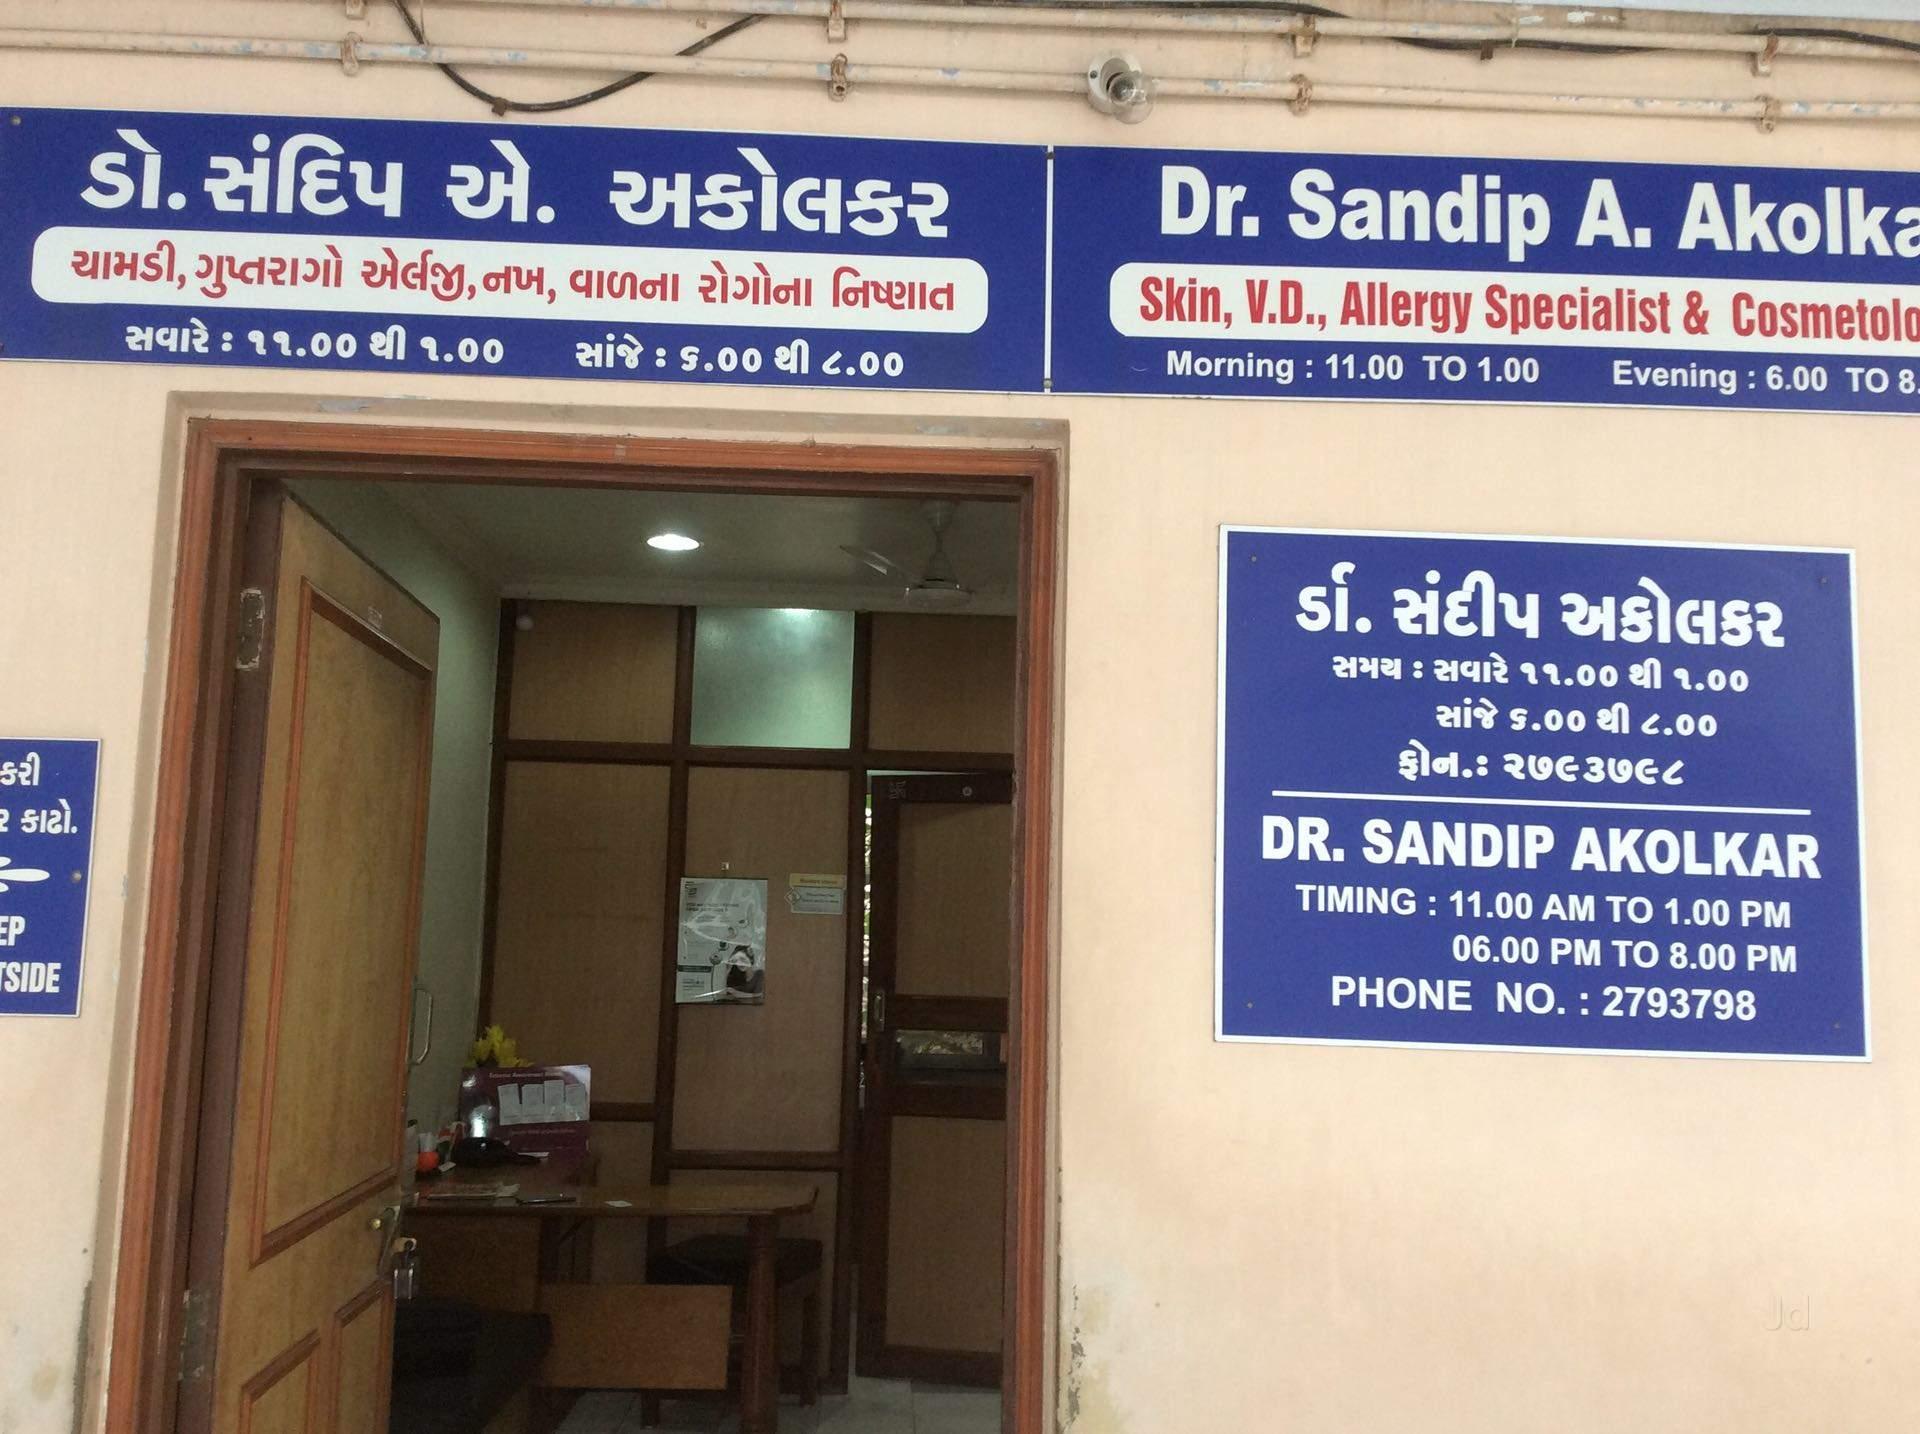 Top 100 Clinics in Vadodara - Best Medical Centers - Justdial